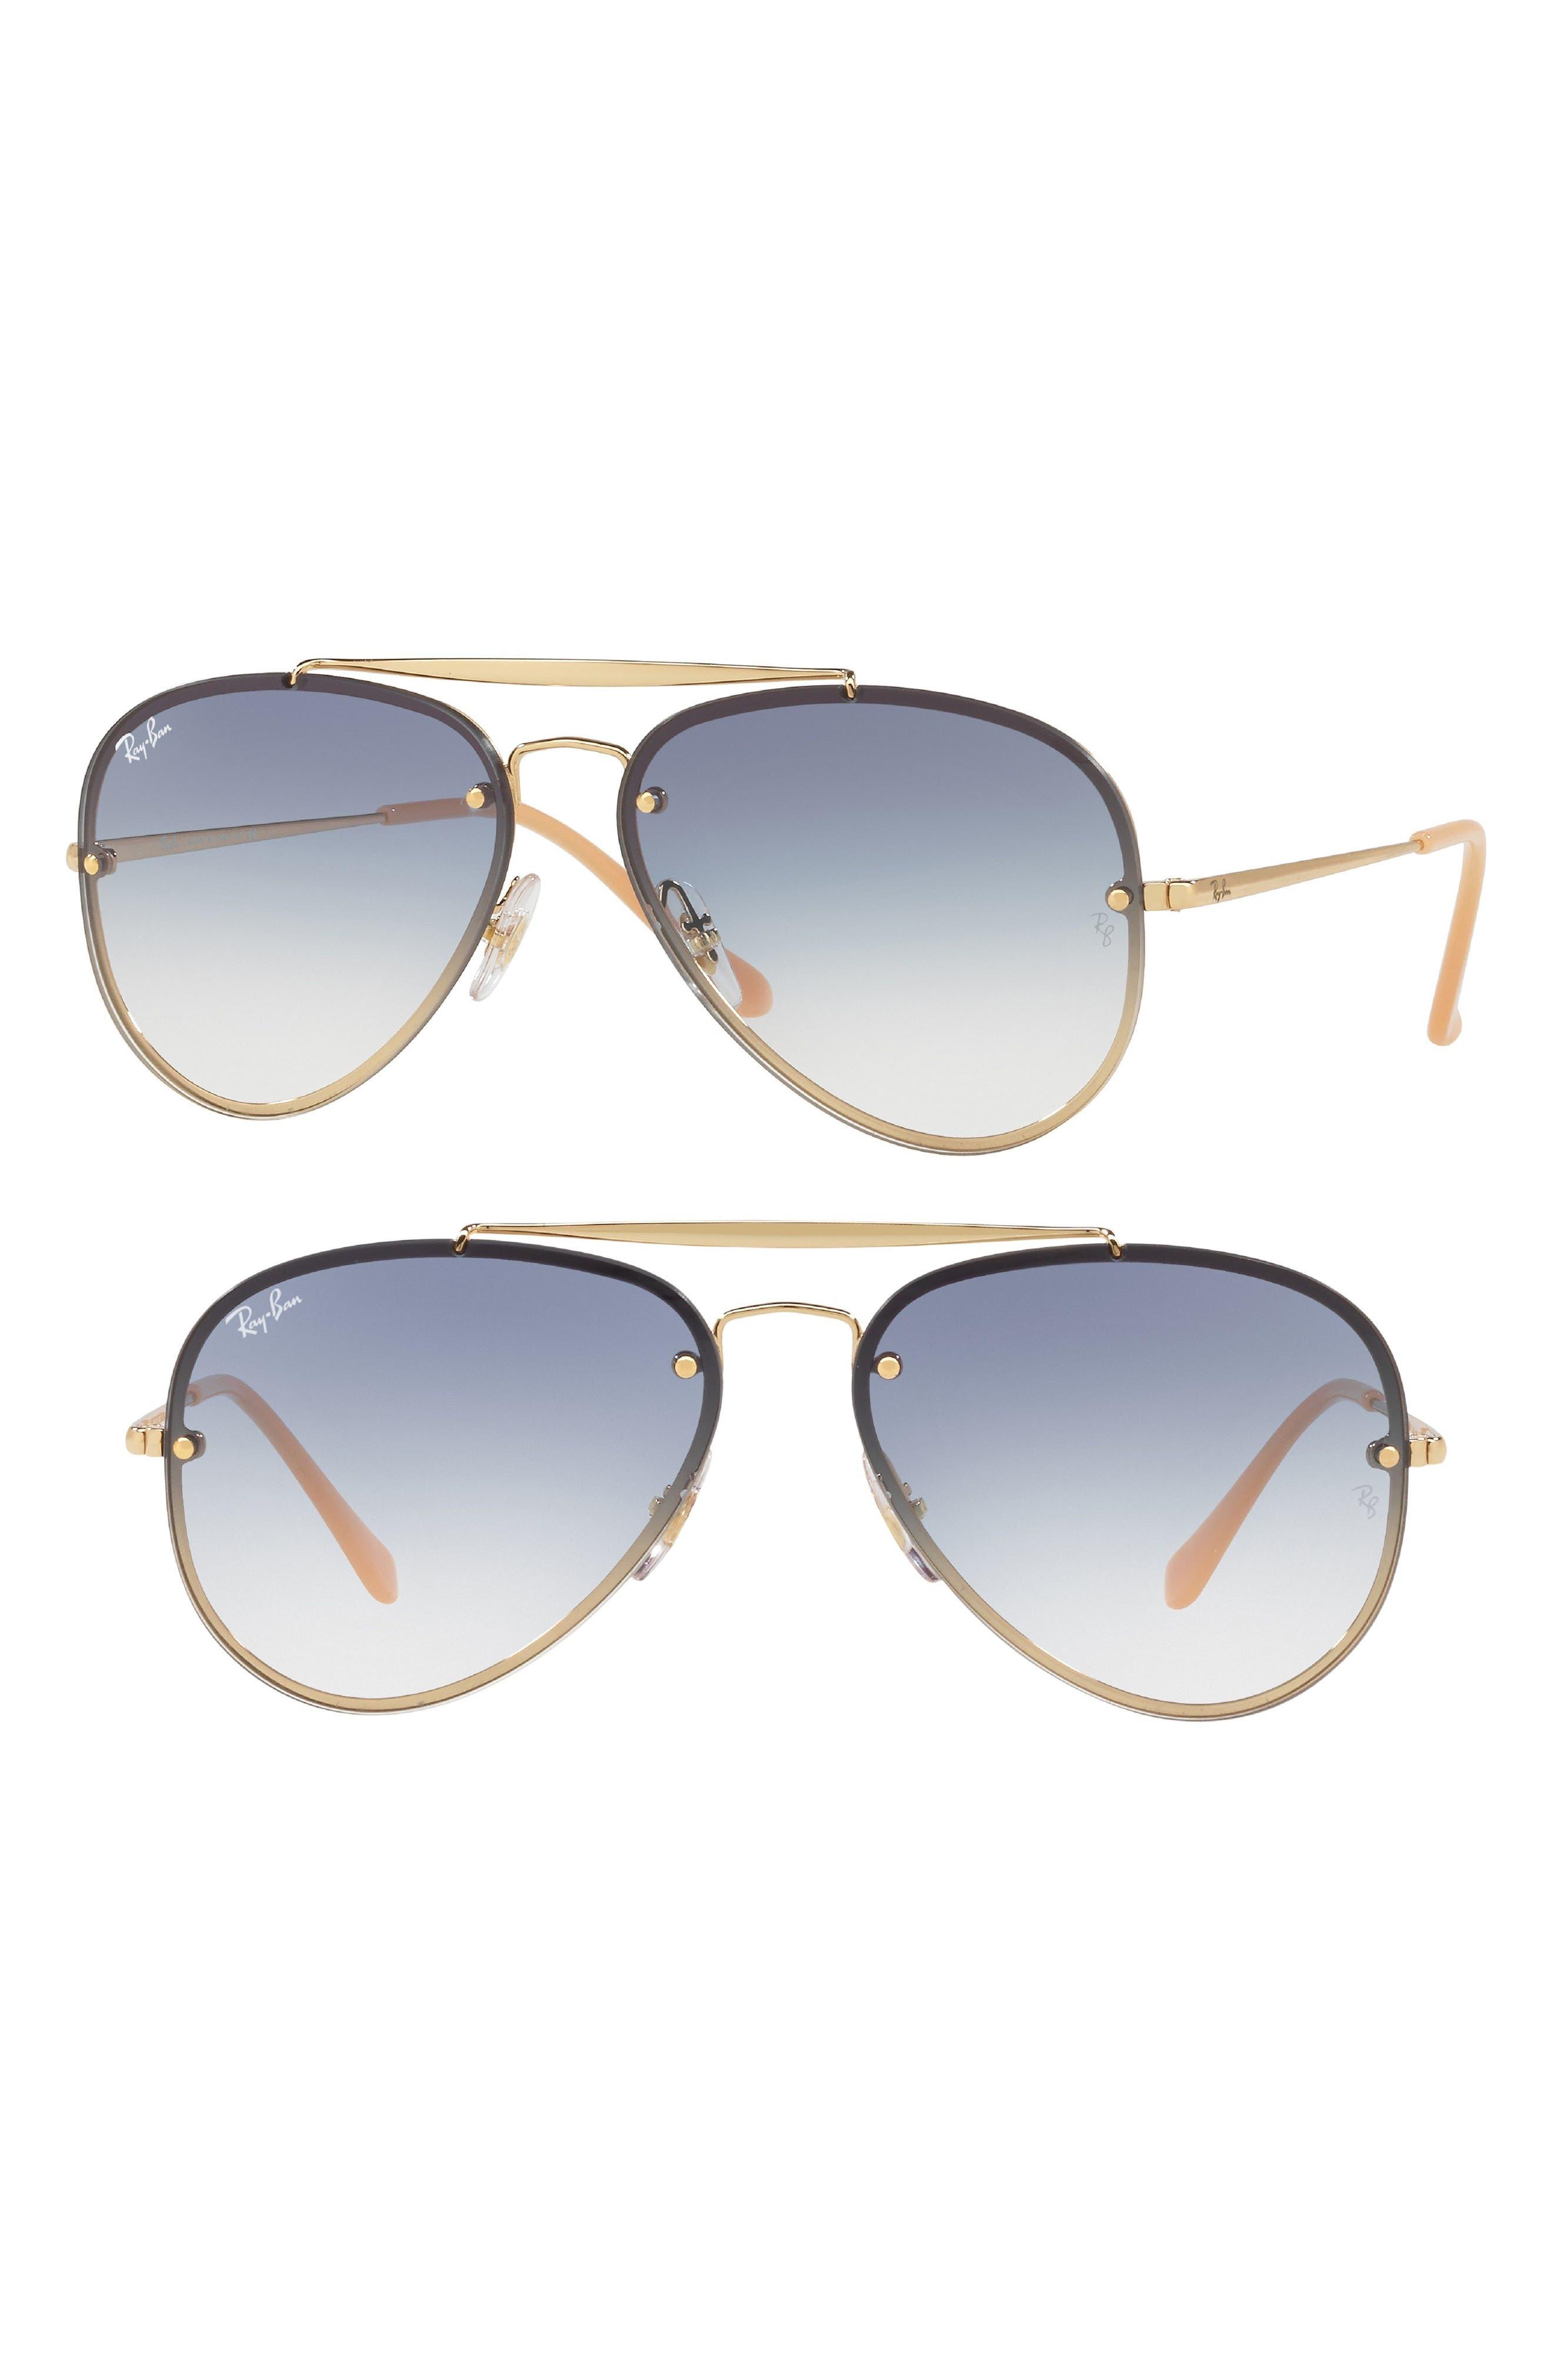 Ray-Ban 61Mm Gradient Lens Aviator Sunglasses - Gold Blue